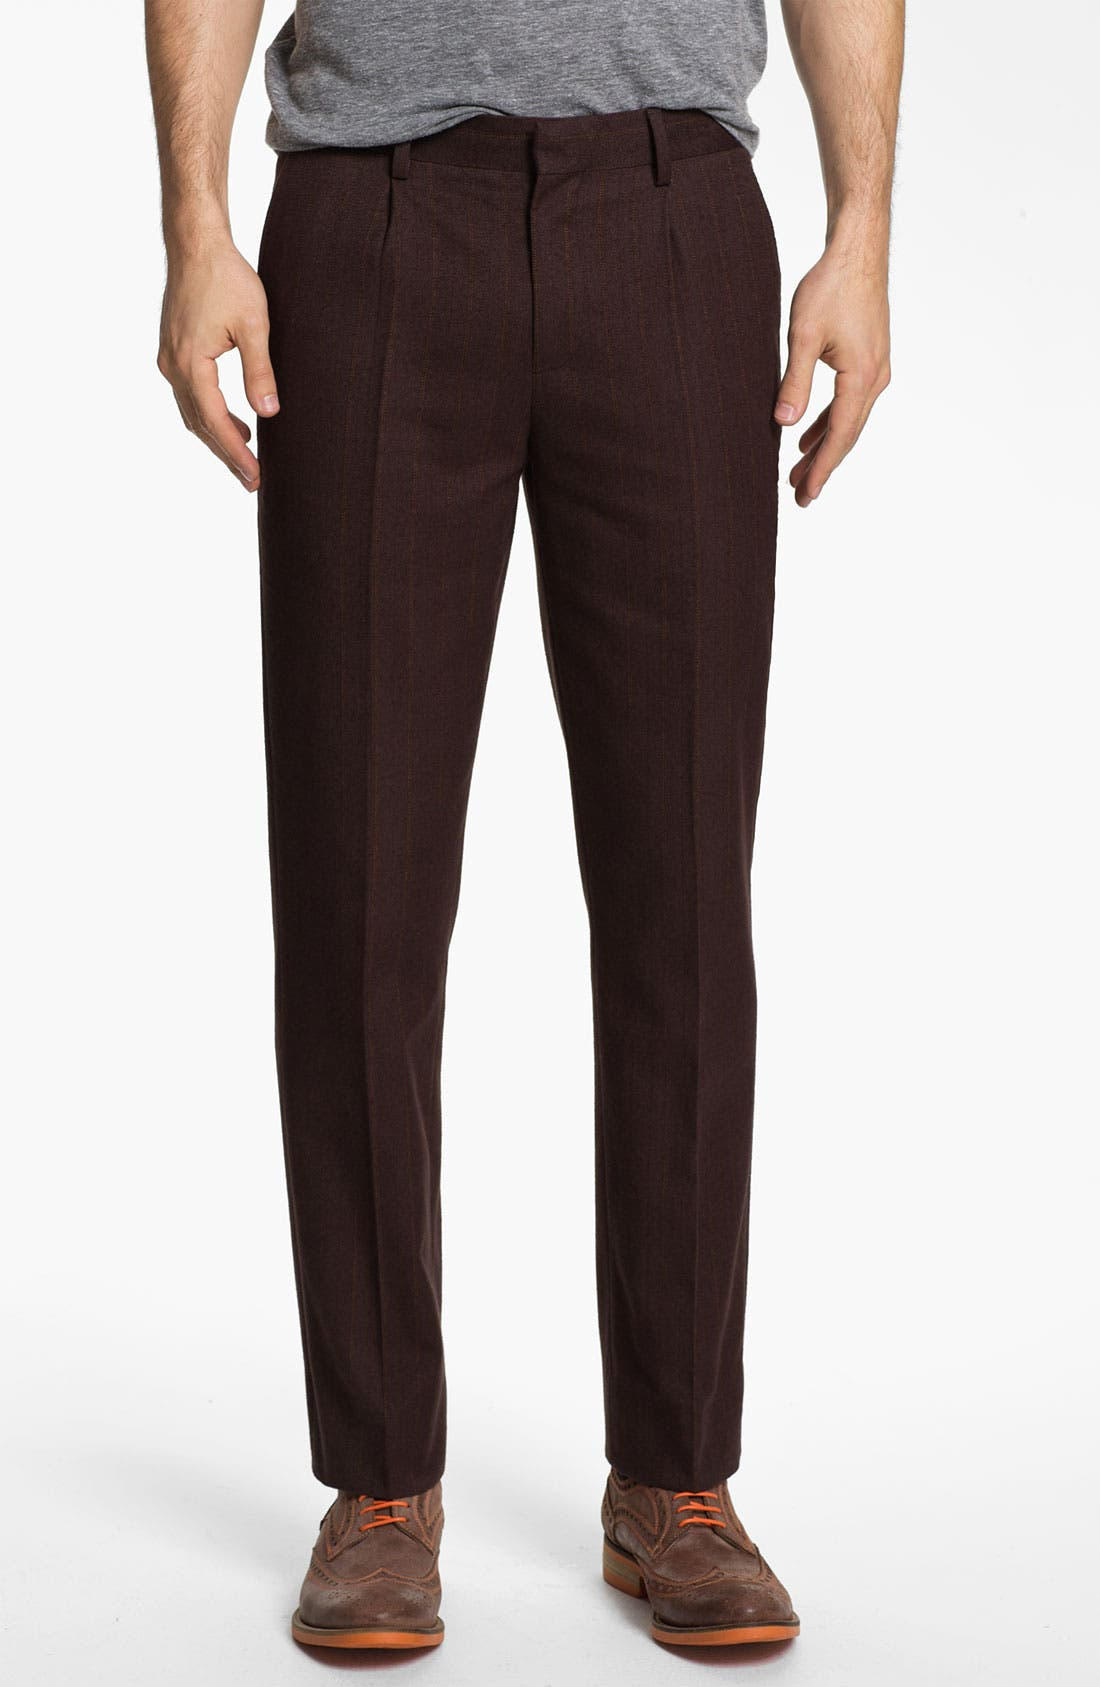 Alternate Image 1 Selected - 1901 Slim Pleated Trousers